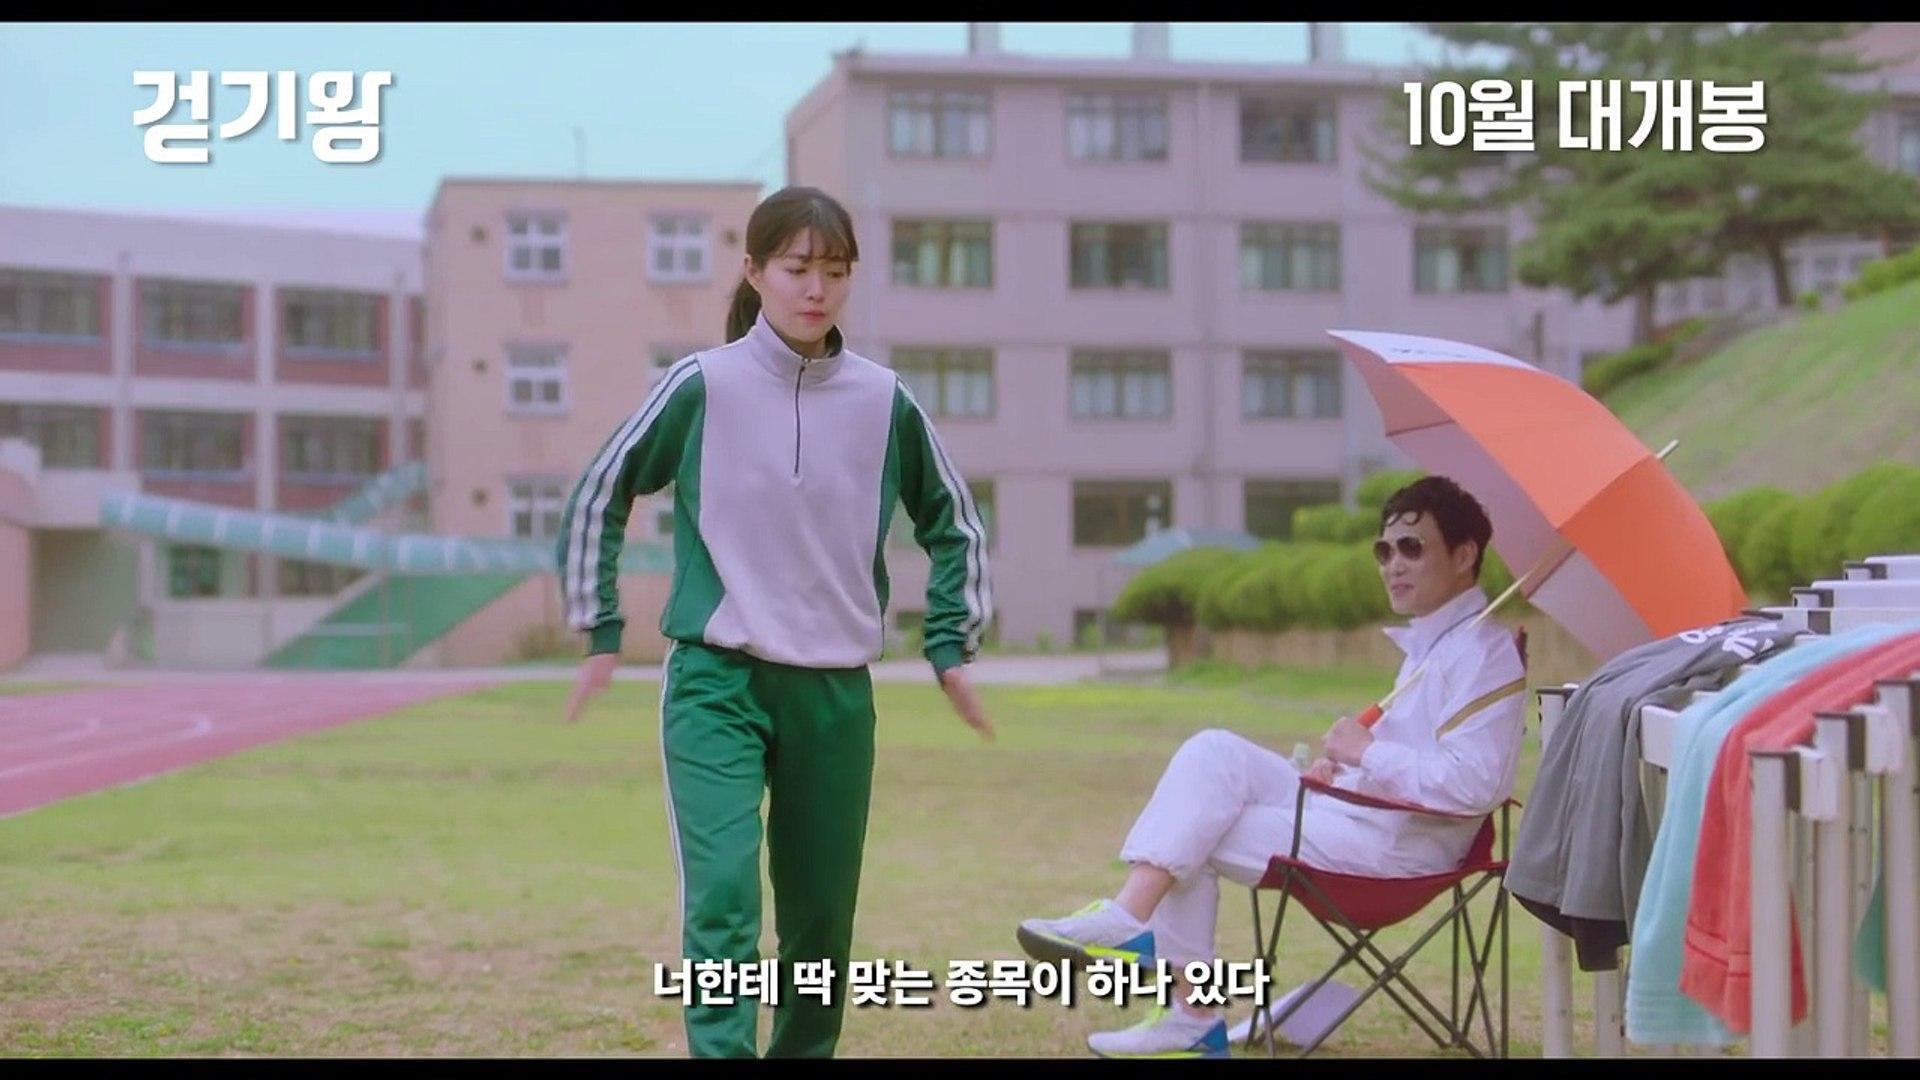 Korean Movie 걷기왕 (Queen of Walking, 2016) 메인 예고편 (Main Trailer)